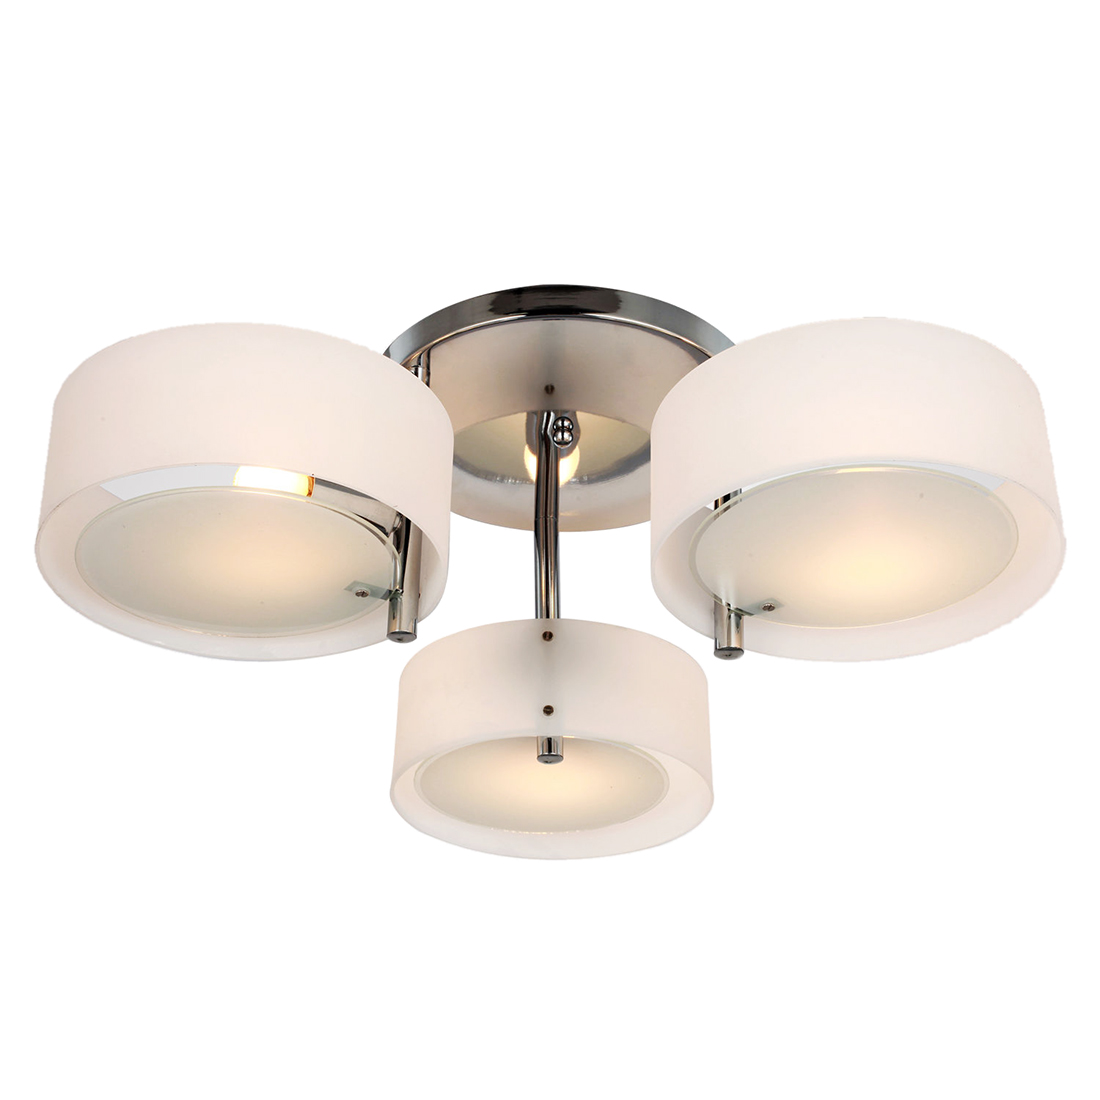 Vintage Modern Fixture Ceiling Light Lighting Crystal  Chandelier Lamp luxury big crystal modern ceiling light lamp lighting fixture